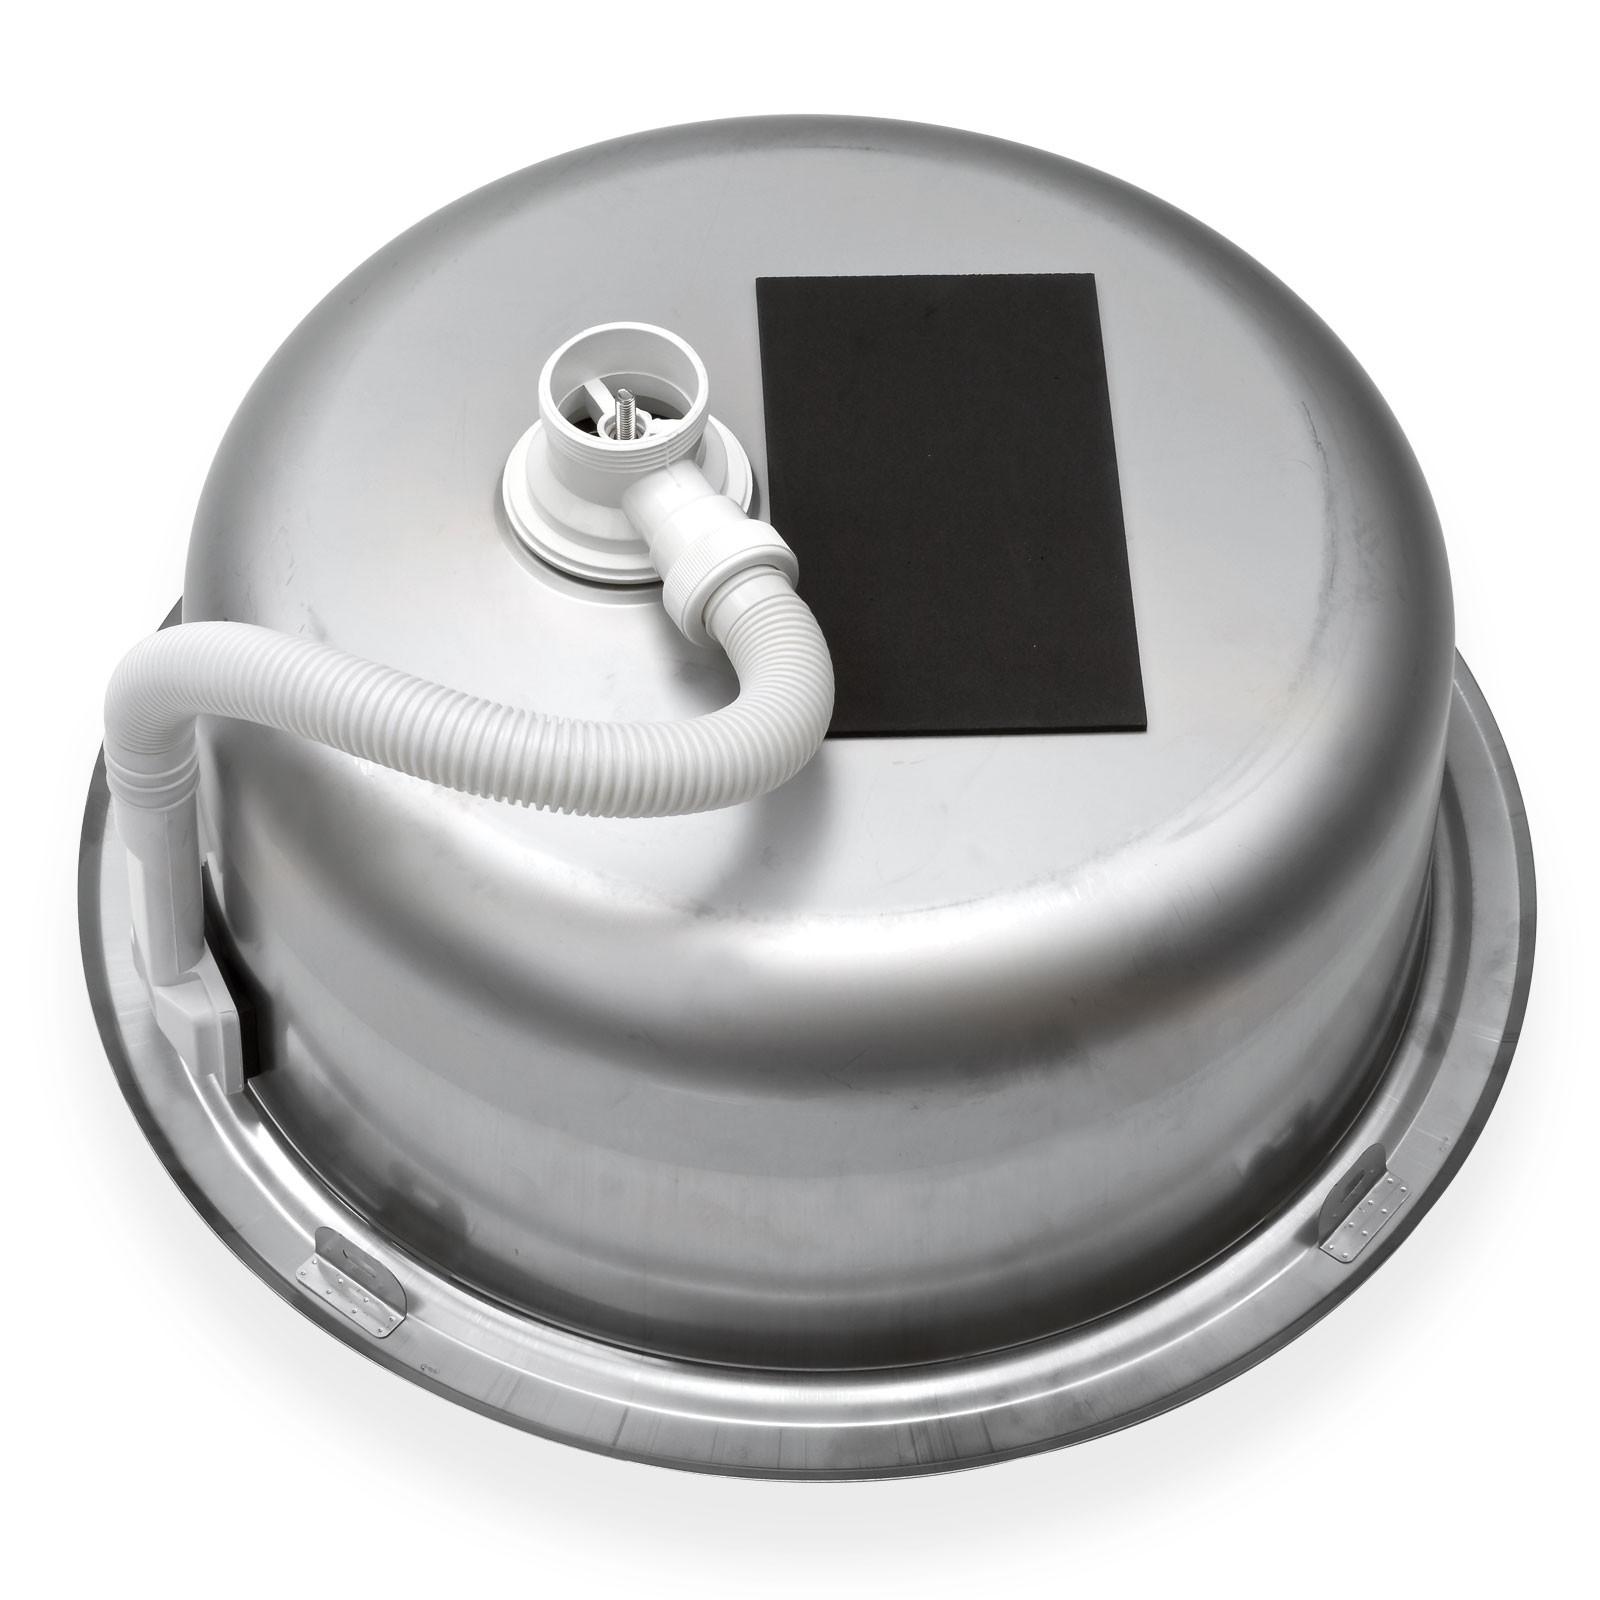 edelstahl einbausp le sp lbecken k chensp le rundbecken rundsp le rund ebay. Black Bedroom Furniture Sets. Home Design Ideas